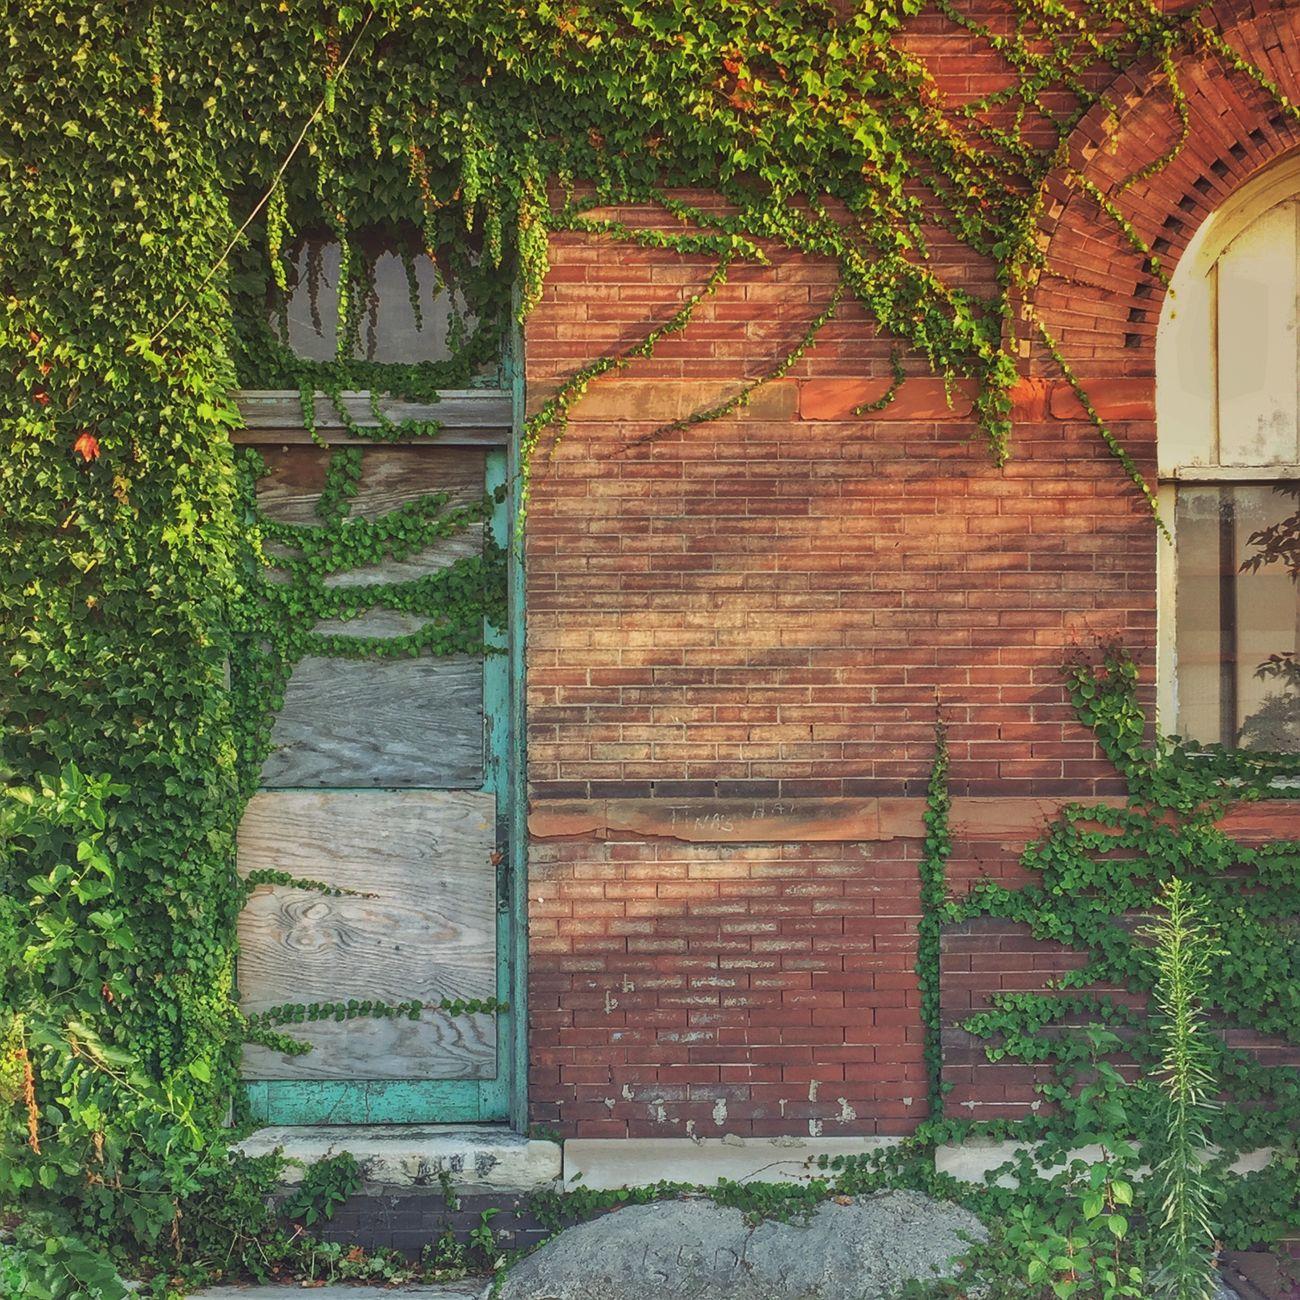 Overgrown wall. Brick Wall Ivy Leaves Door